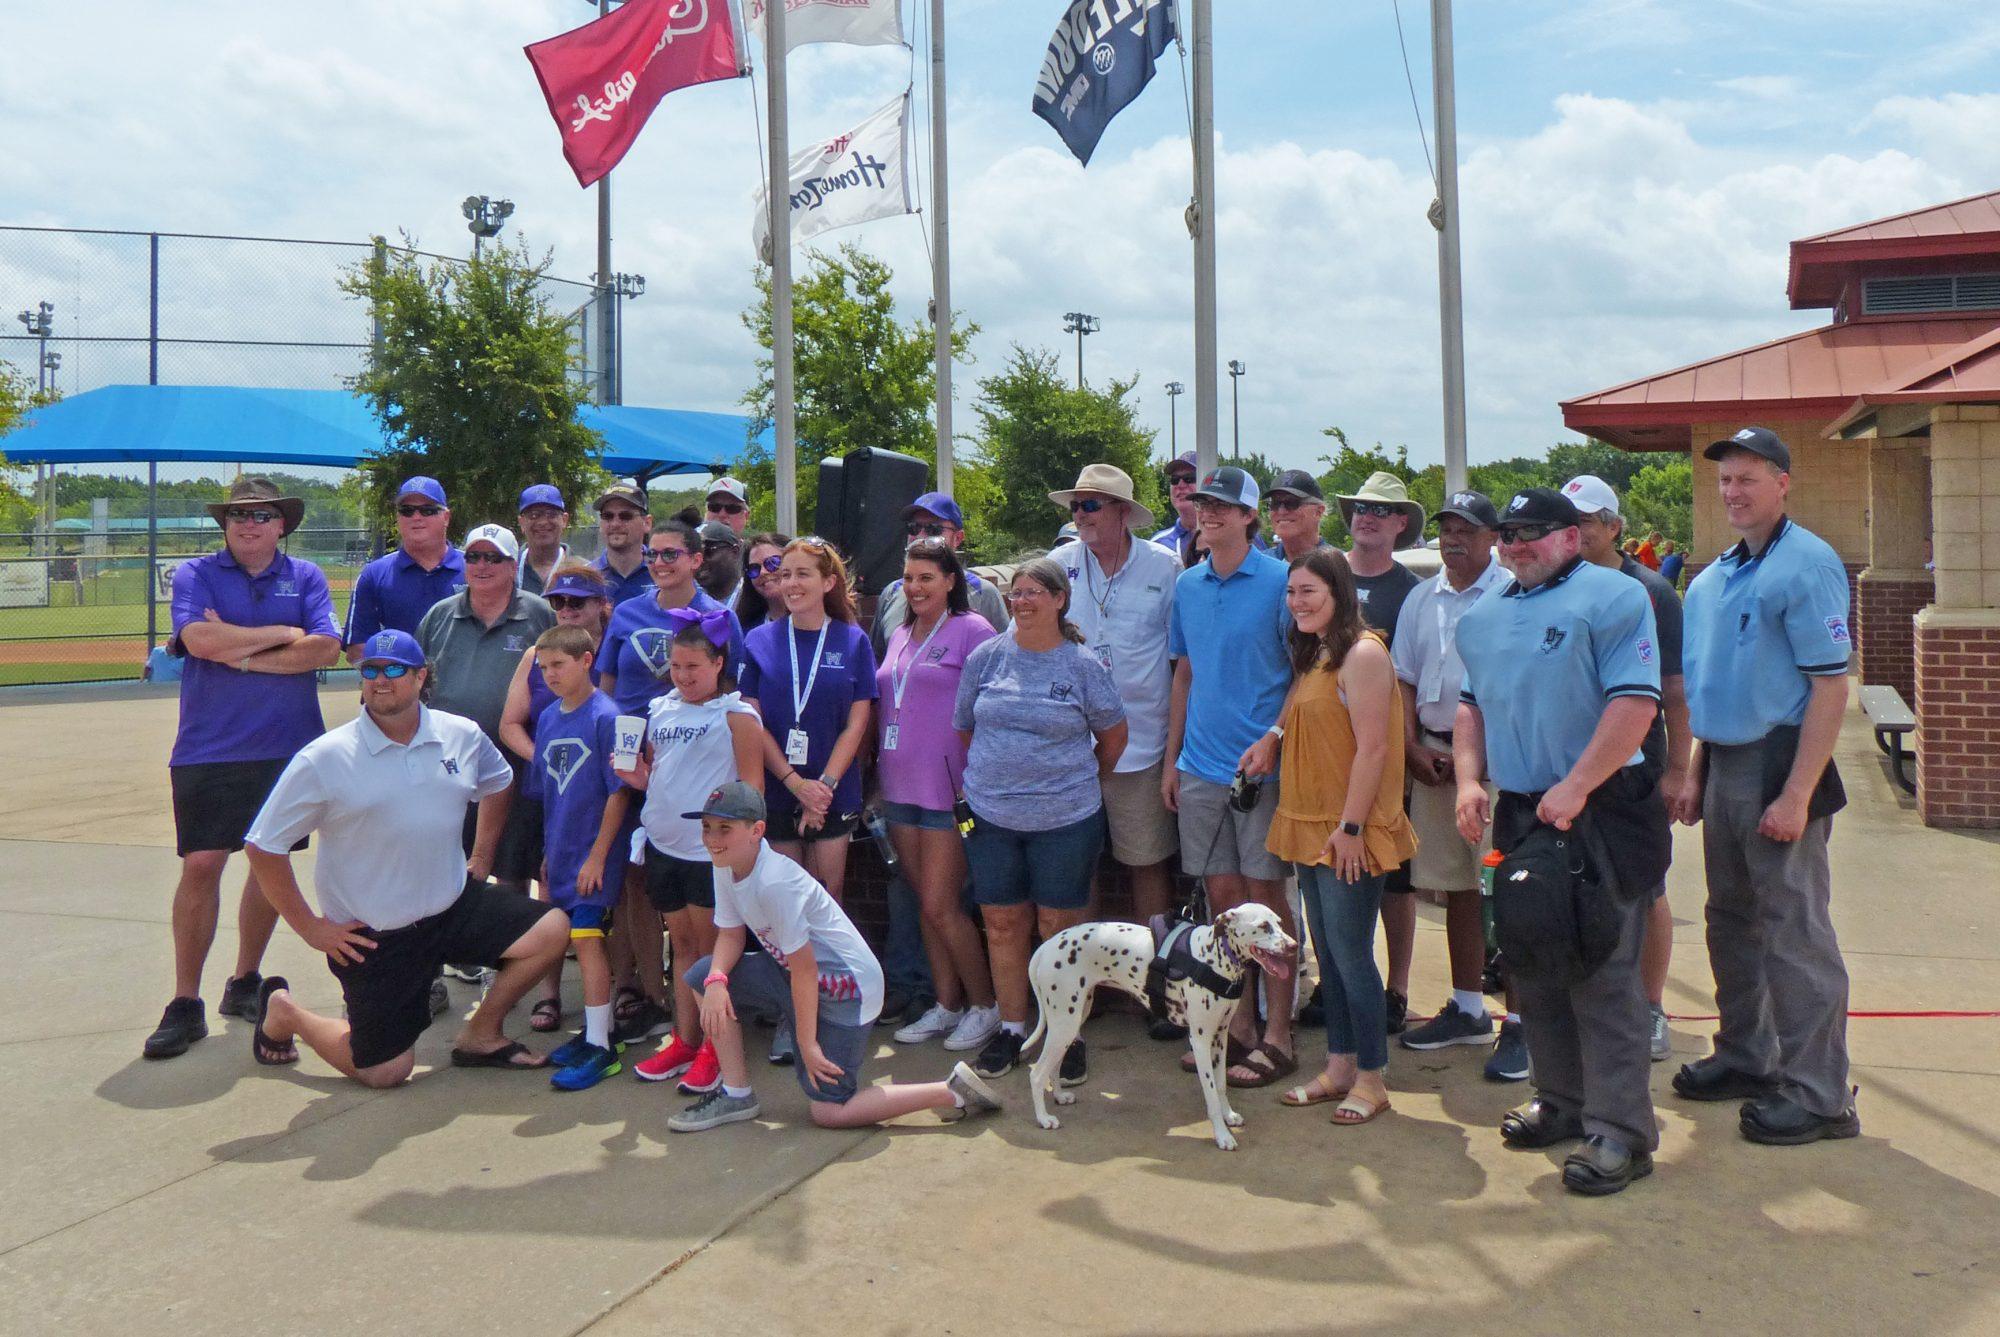 Arlington (Texas) Southwest Little League earns 2019 Carl E. Stotz Little League Community Award